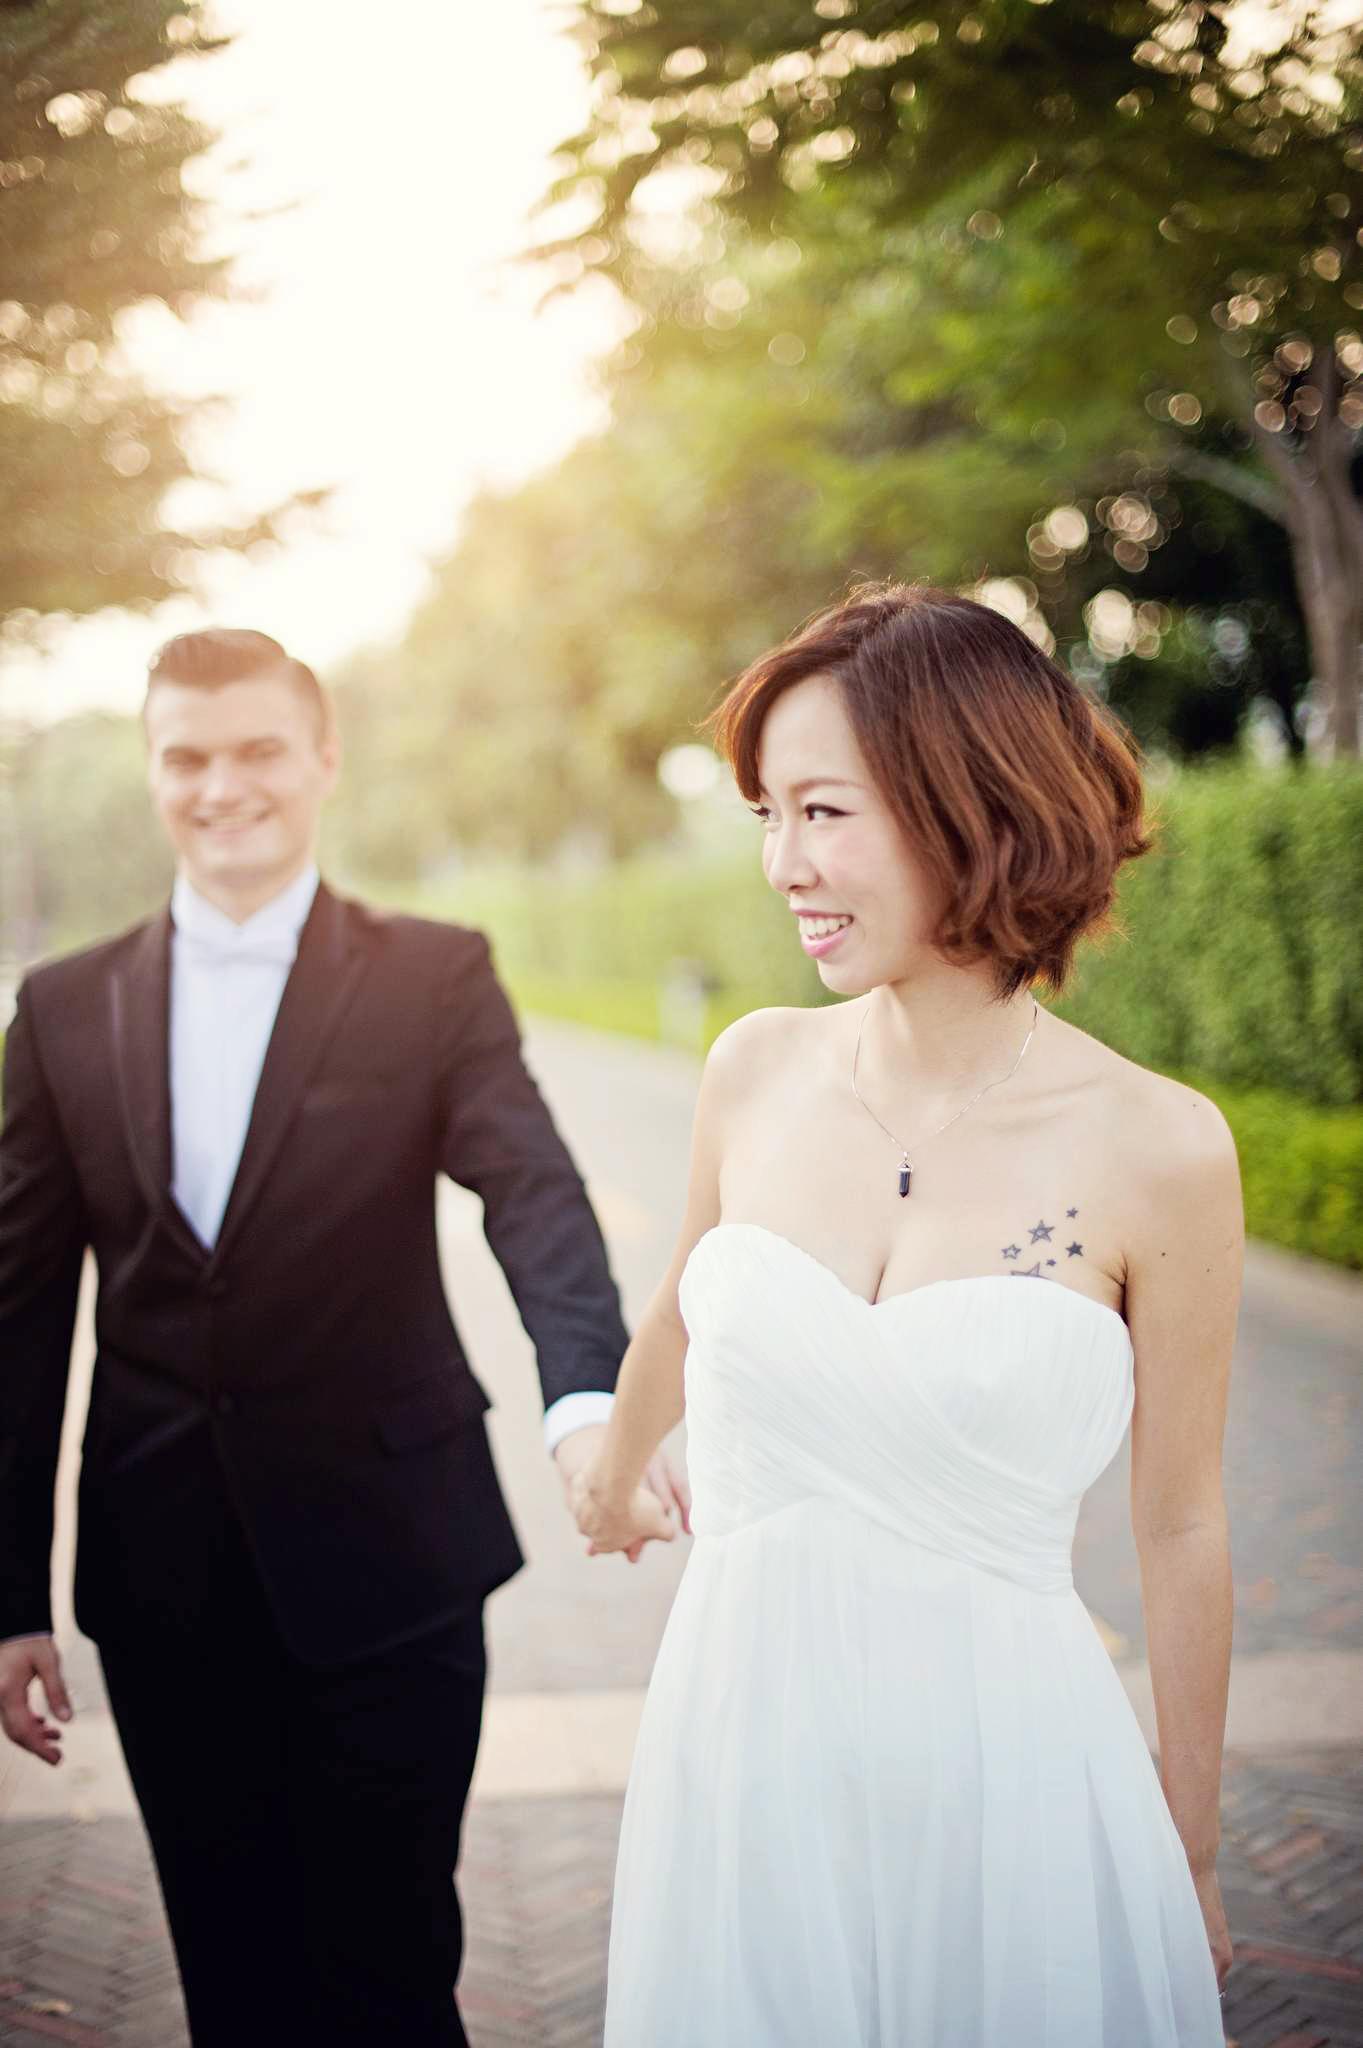 Chris_Hui_ShenZhen_Prewedding_Photography221.jpg